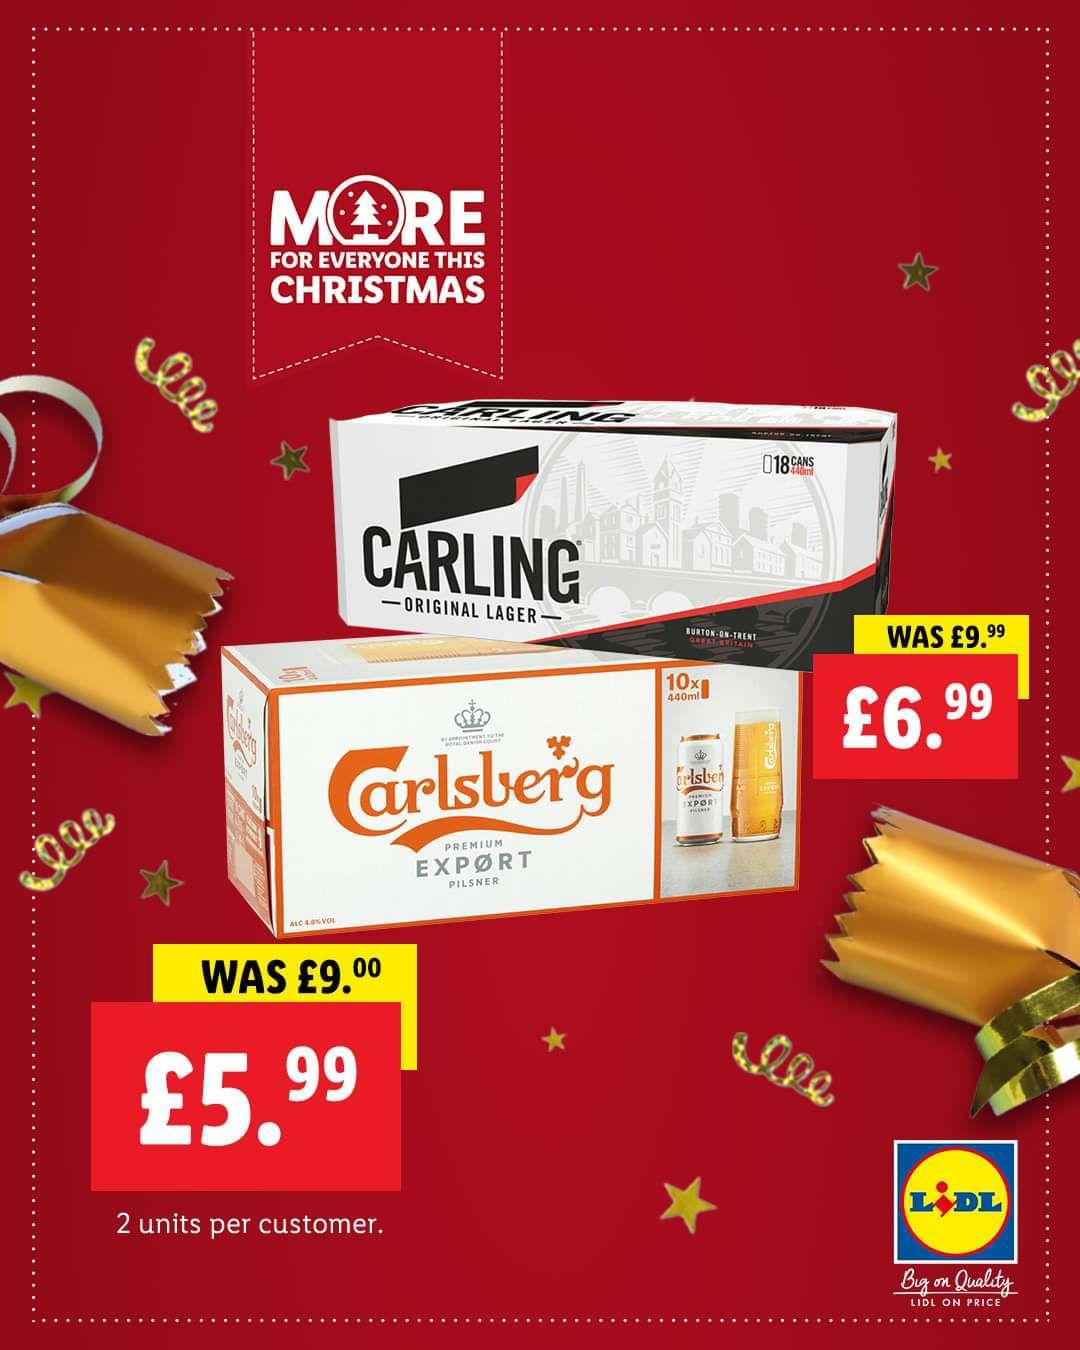 10x 440ml Carlsberg Export £5.99 / 18x 440ml Carling £6.99 @ Lidl Northern Ireland